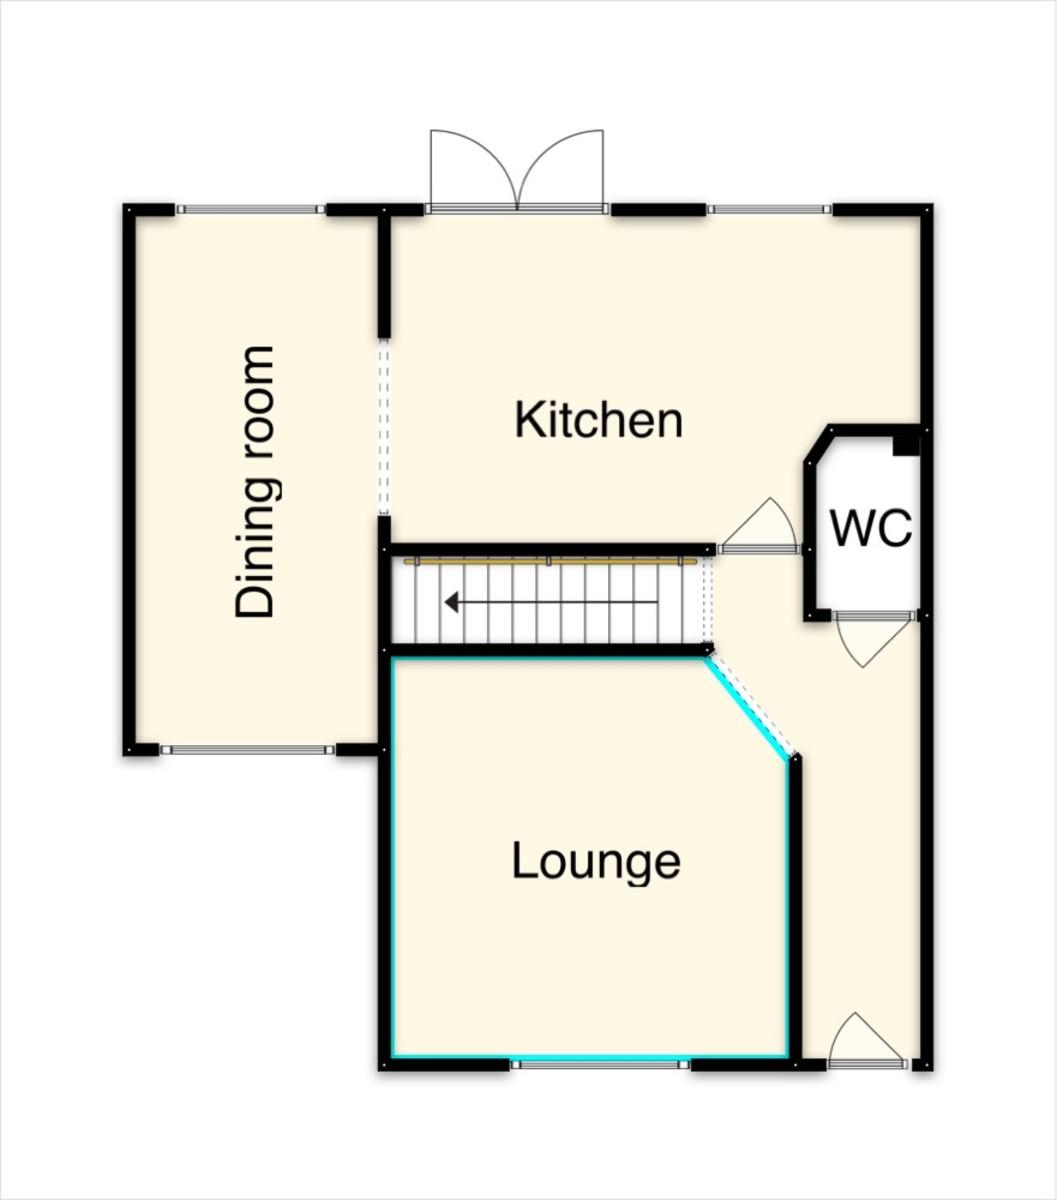 Floor Plan-Voisey Close, Chudleigh, Newton Abbot